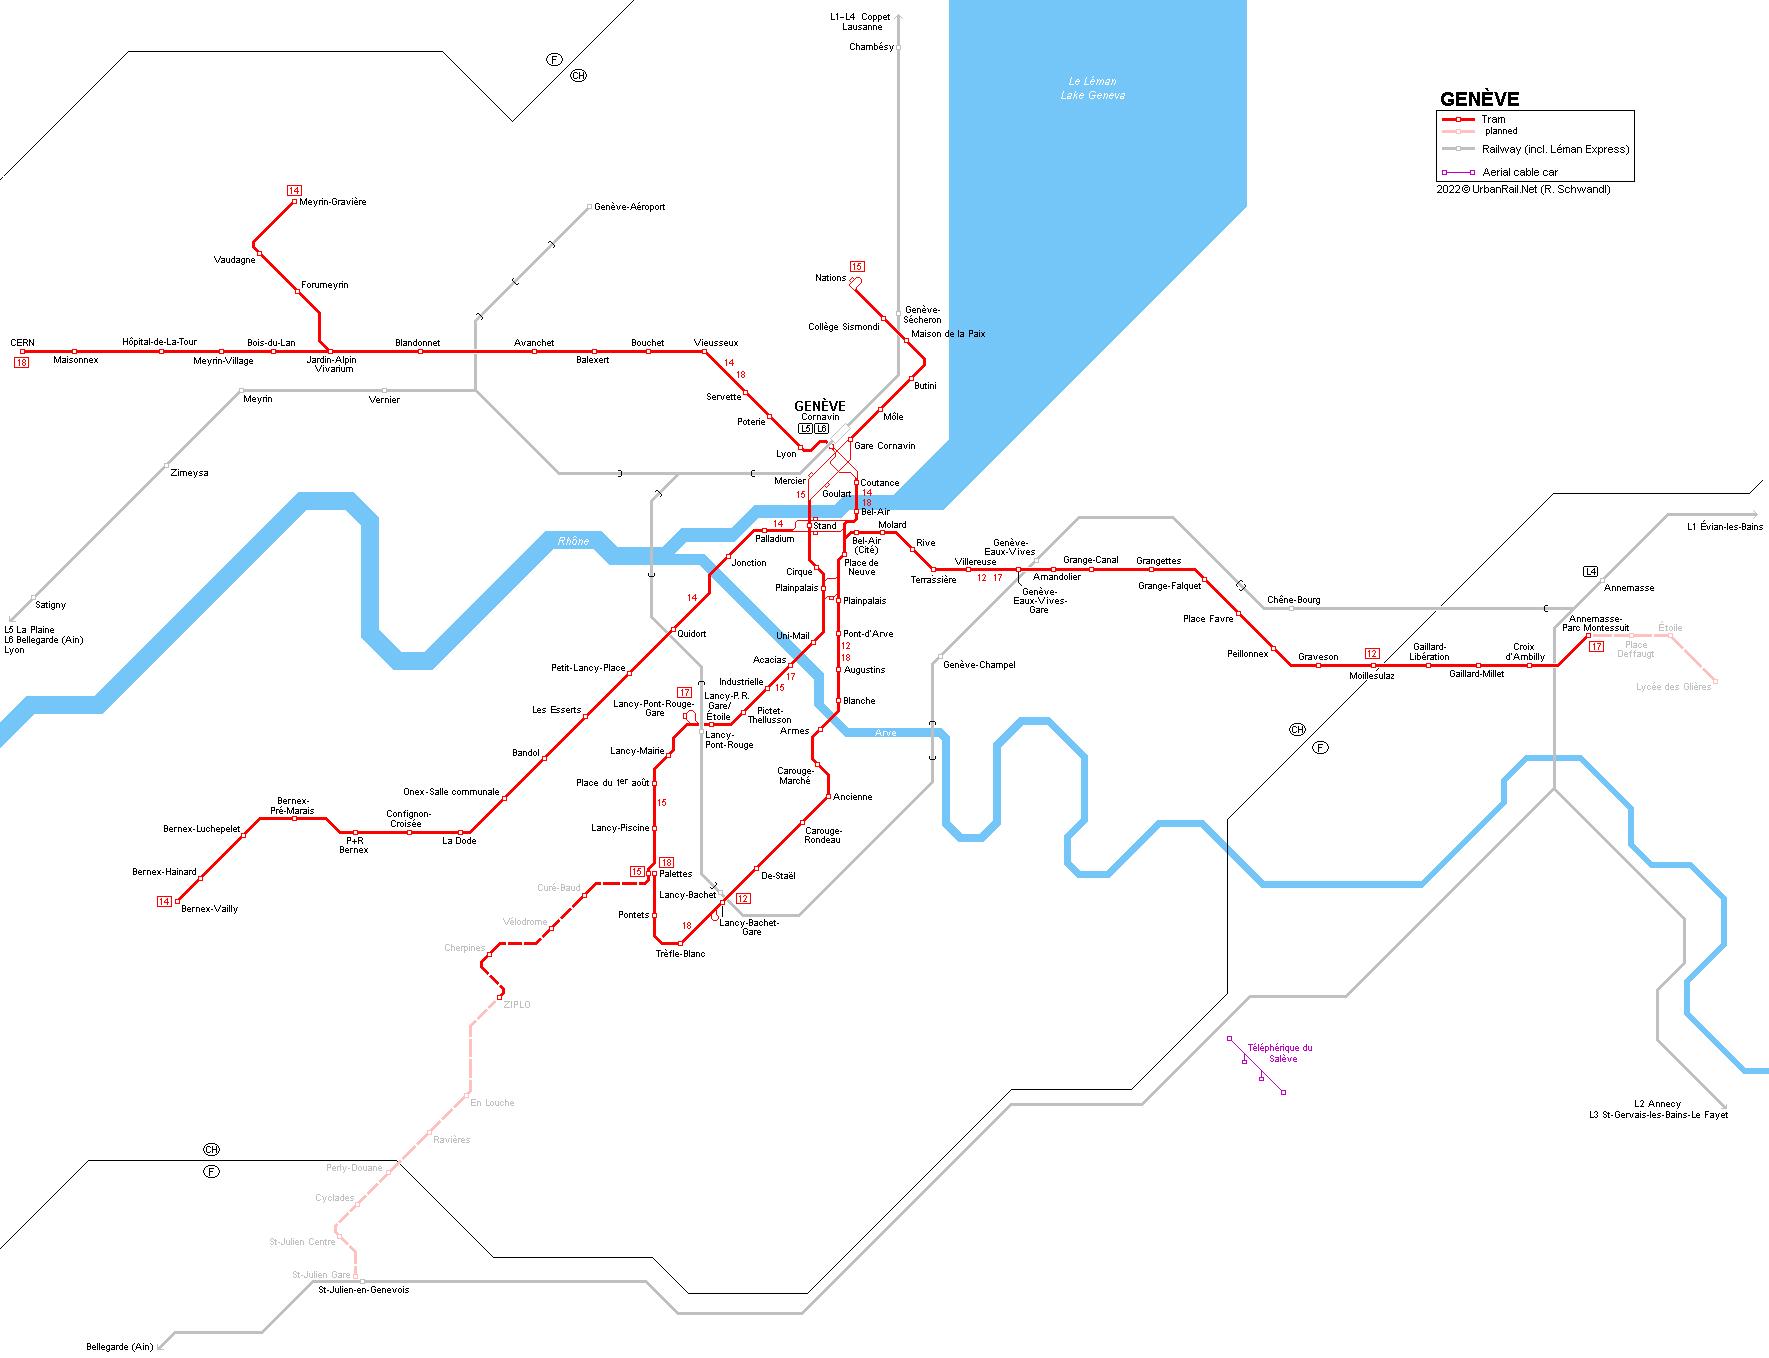 UrbanRail.Net > Europe > Switzerland | Suisse > Genève ... on vienna map, lake geneva, genoa map, zurich map, wittenberg on map, munich map, helsinki map, trent map, lapland map, rhone river map, cadiz map, sardinia map, swiss map, the hague map, africa map, singapore map, corsica map, europe map, john calvin, switzerland map, sweden map, zürich, ashtabula map,